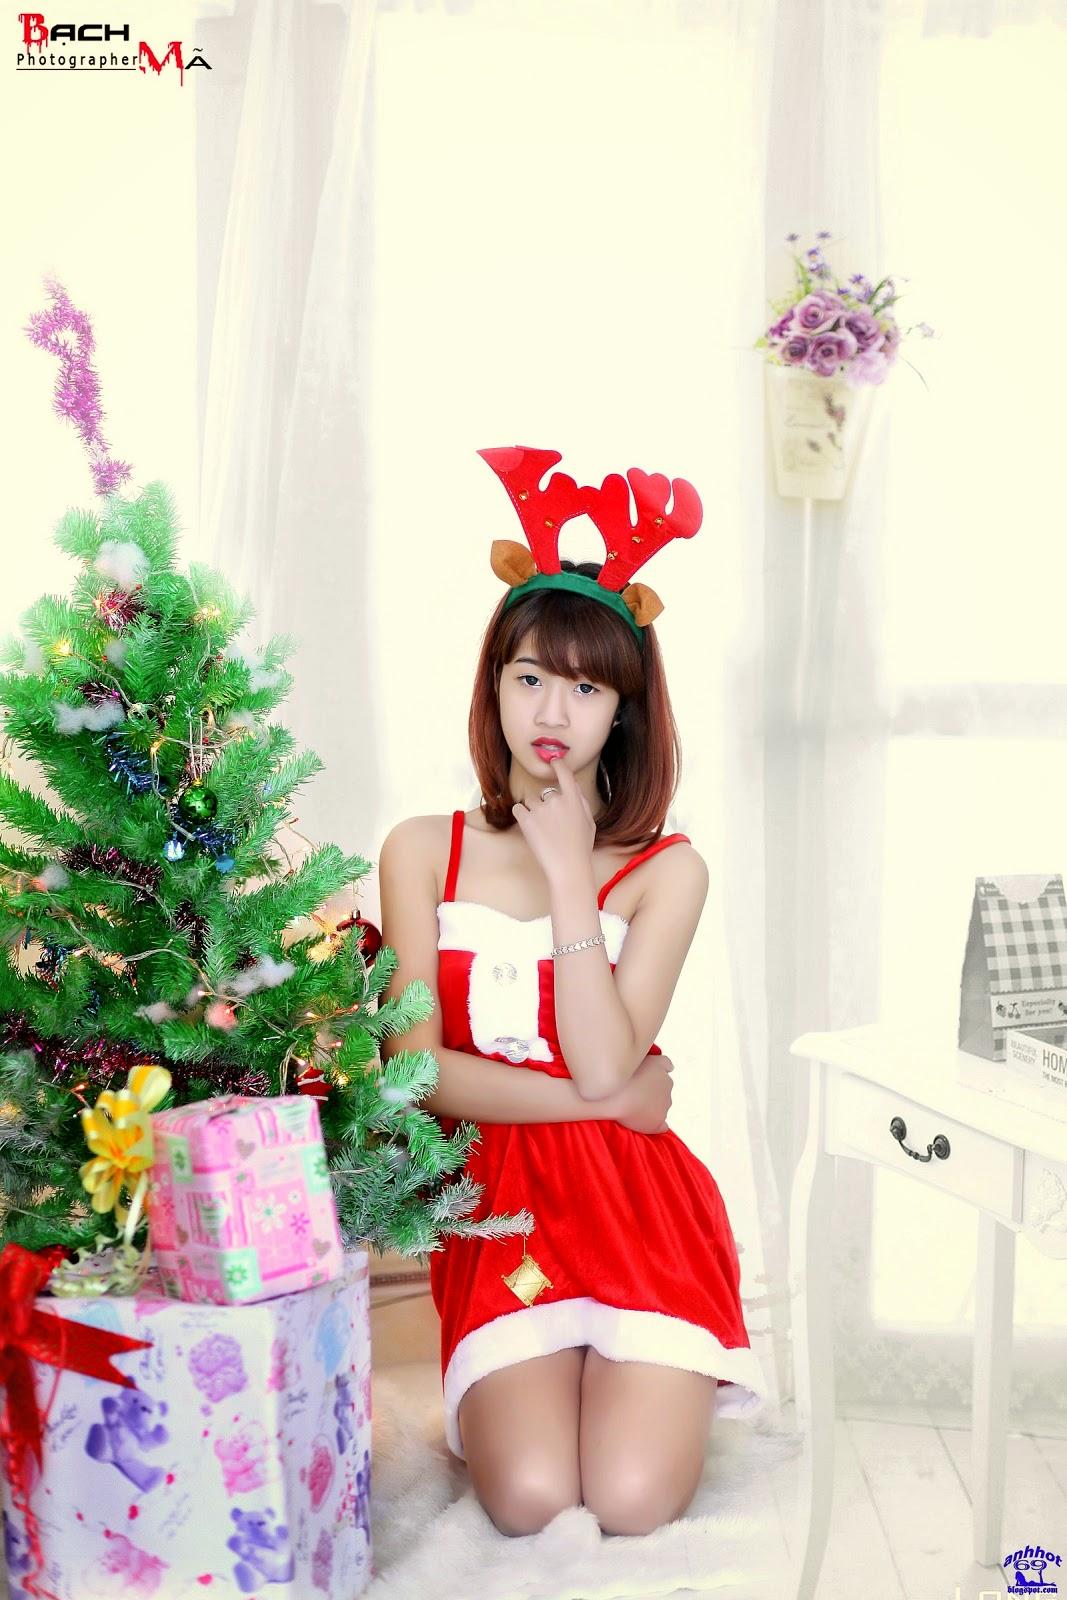 merry-christmas_1412251610_03